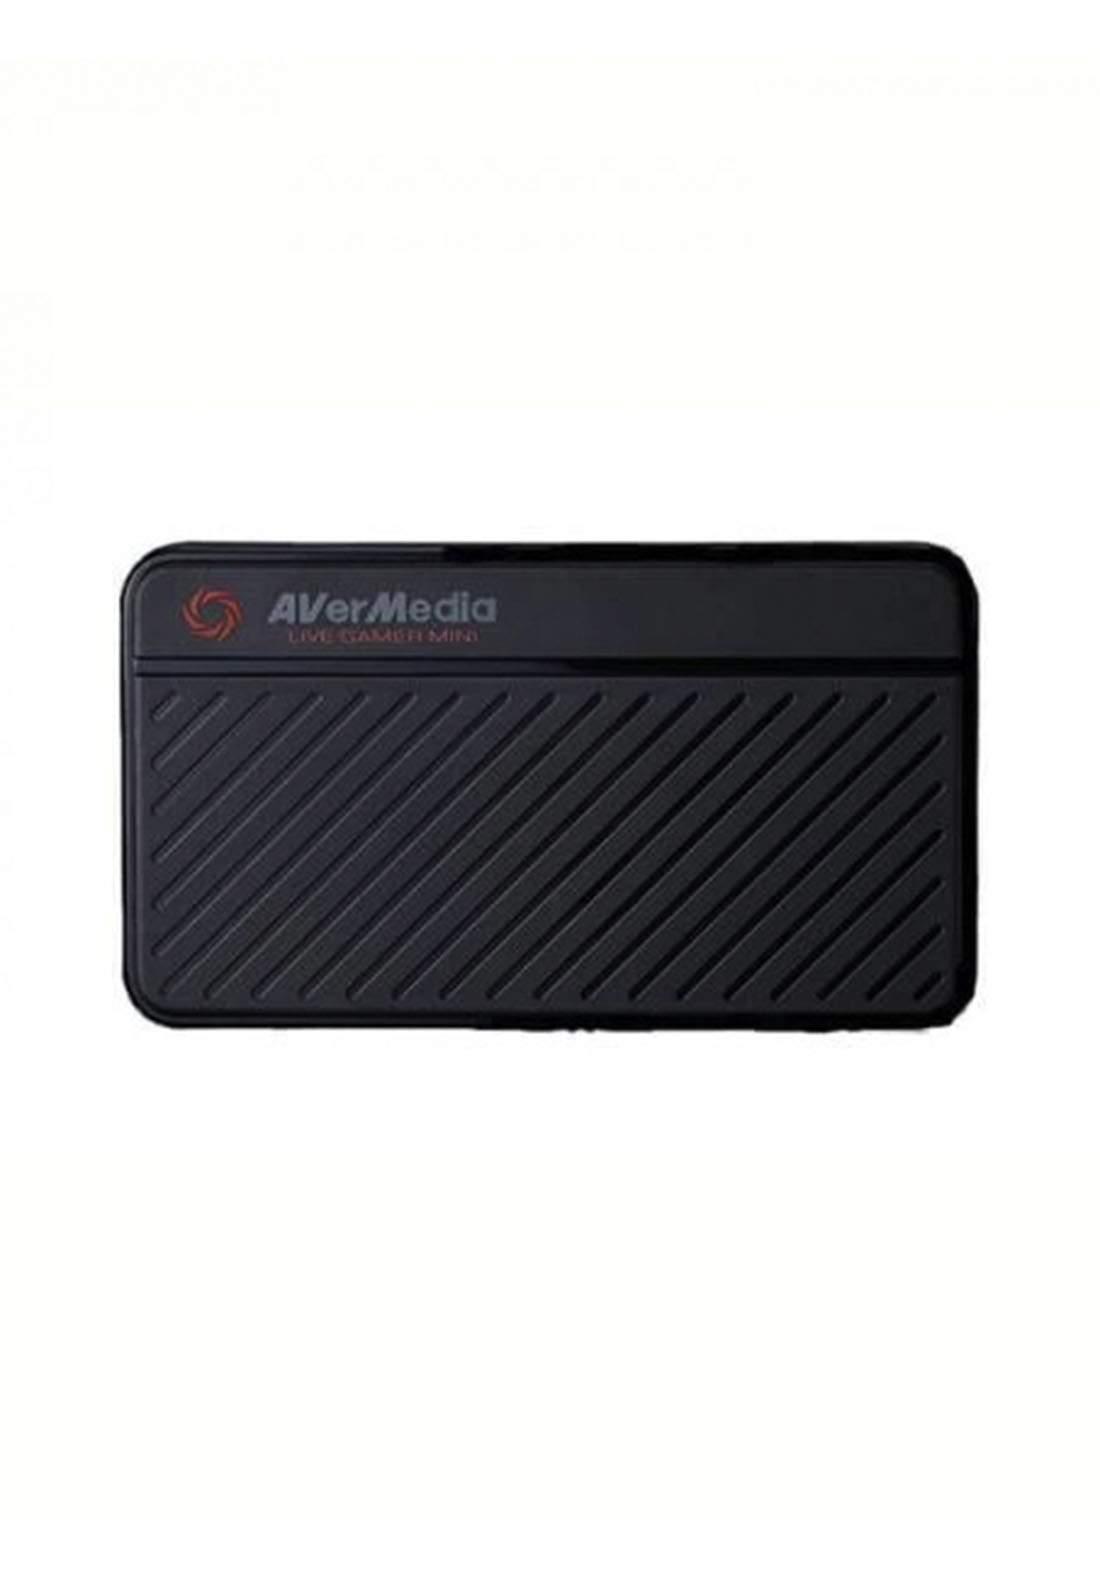 Avermedia GC11  Live Gamer Mini-Black